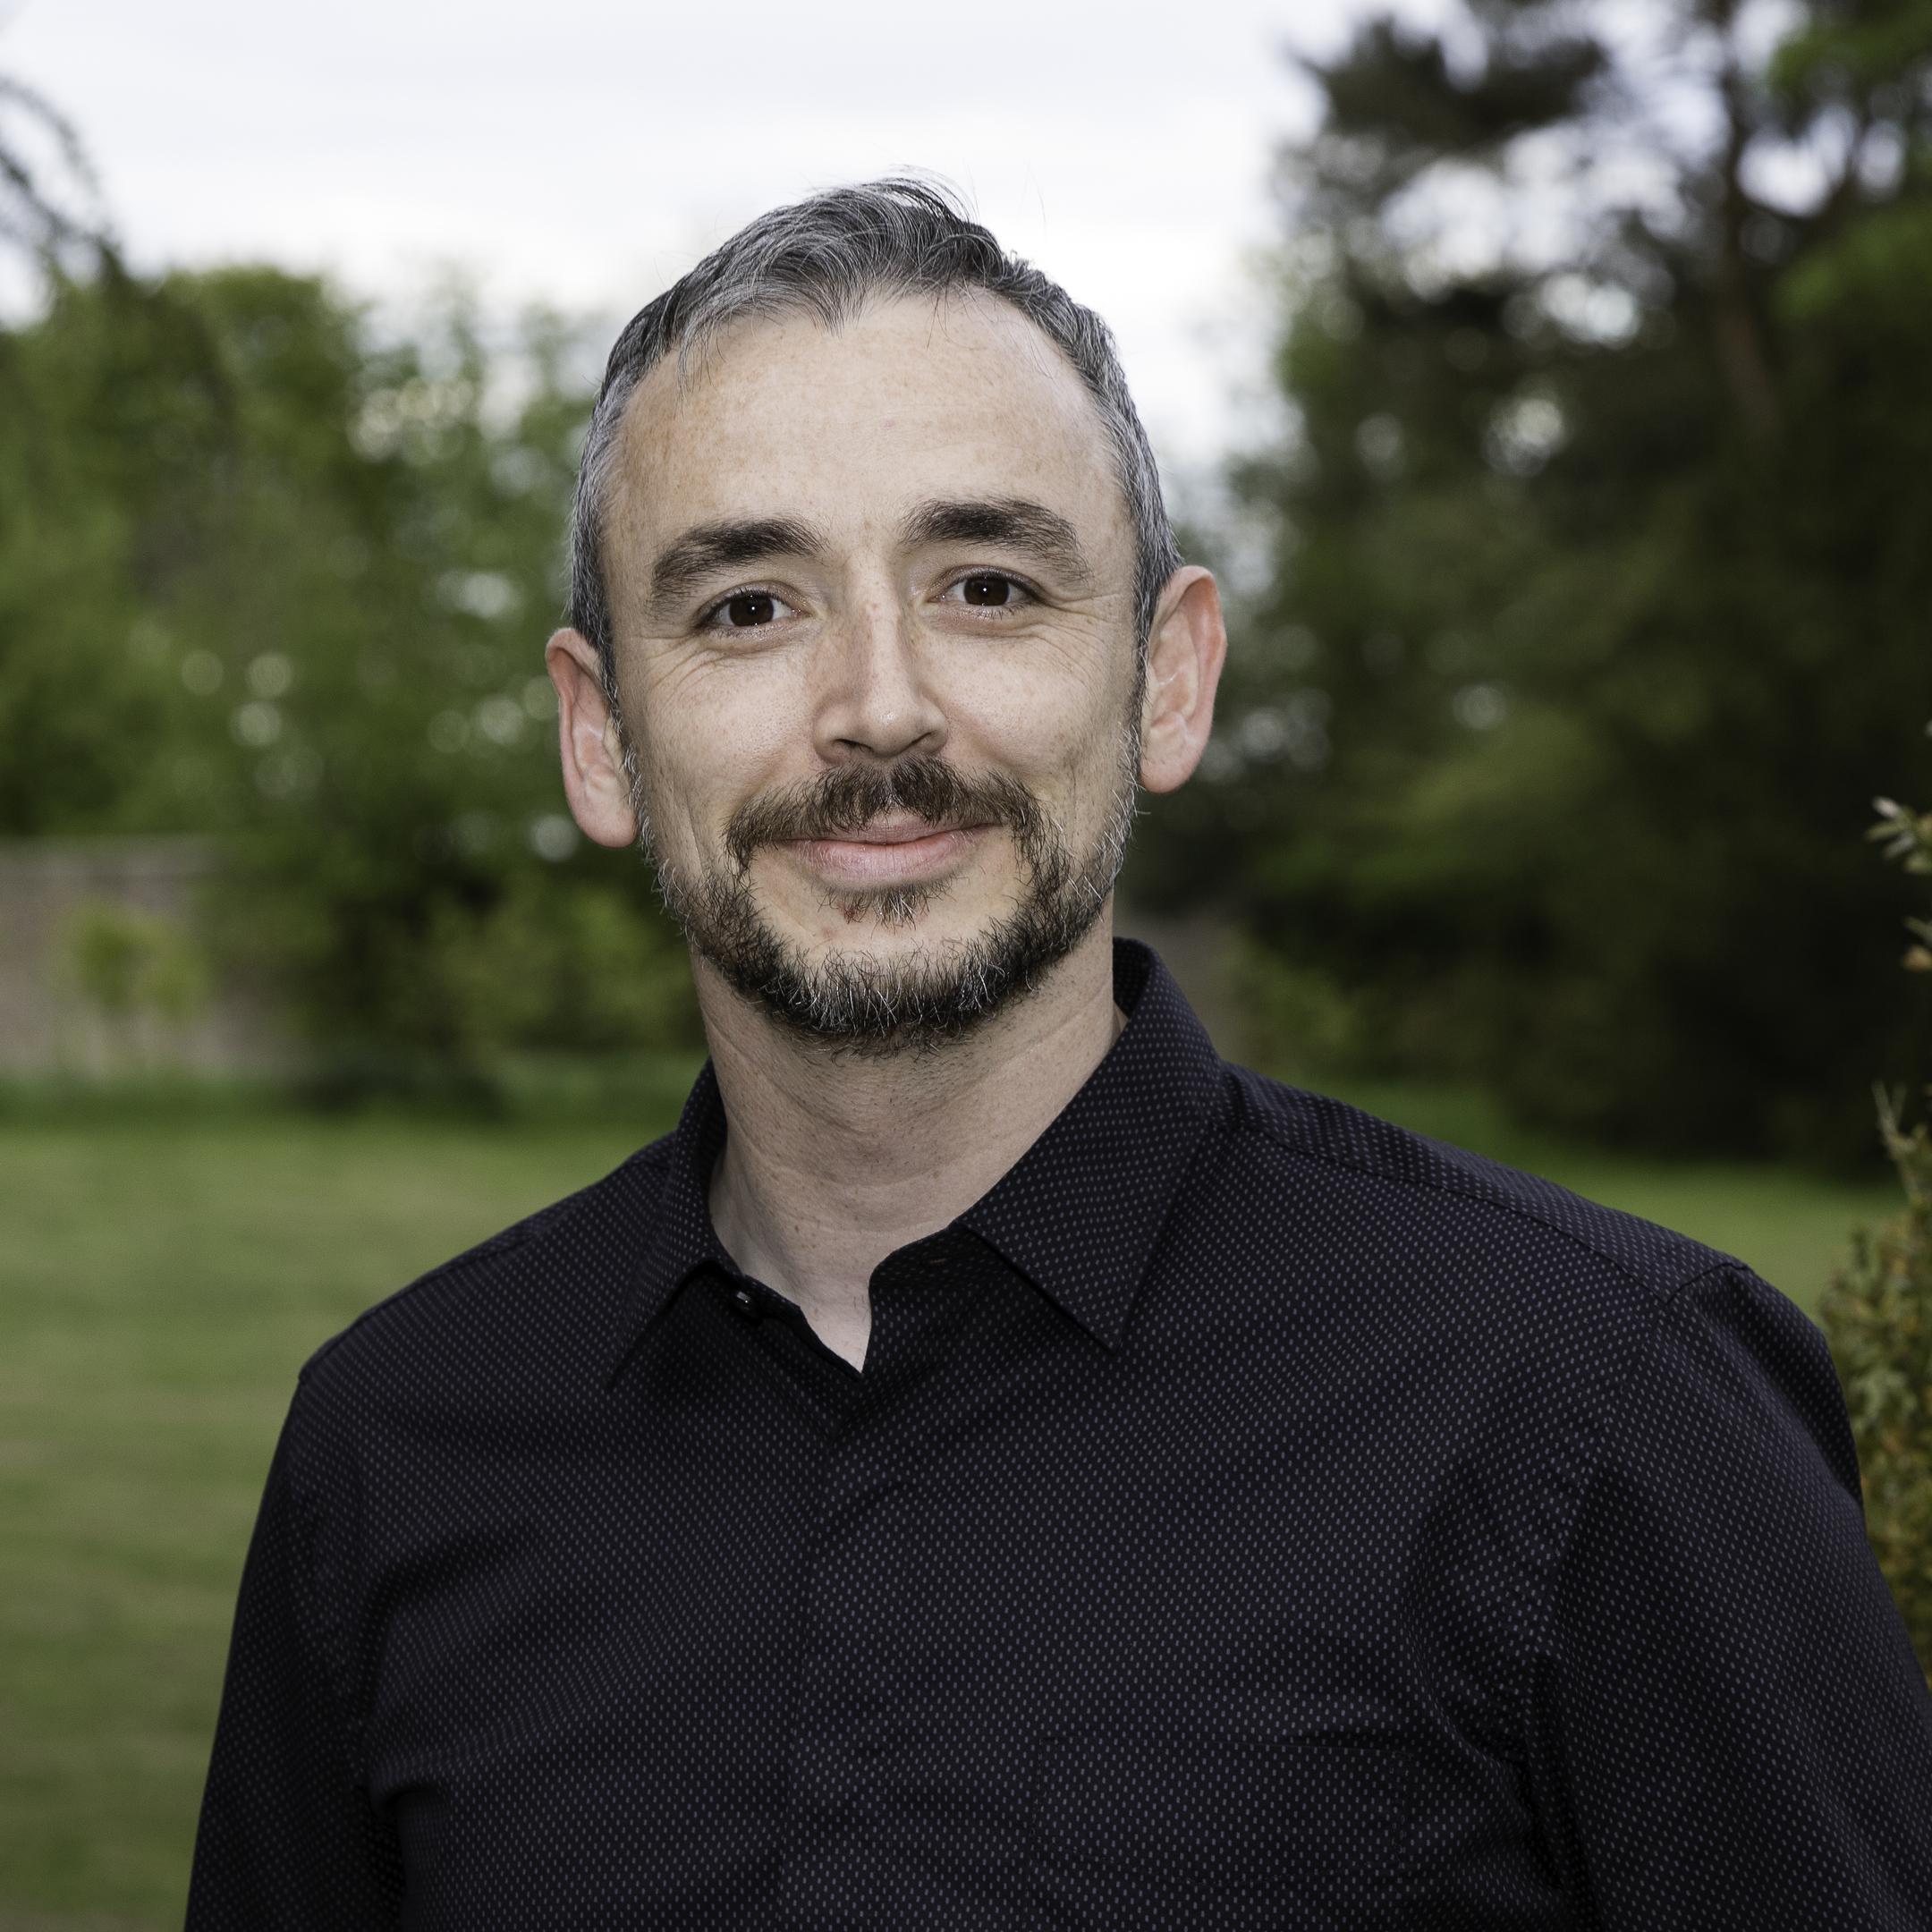 Jim Latto of Baker Hughes, a GE company